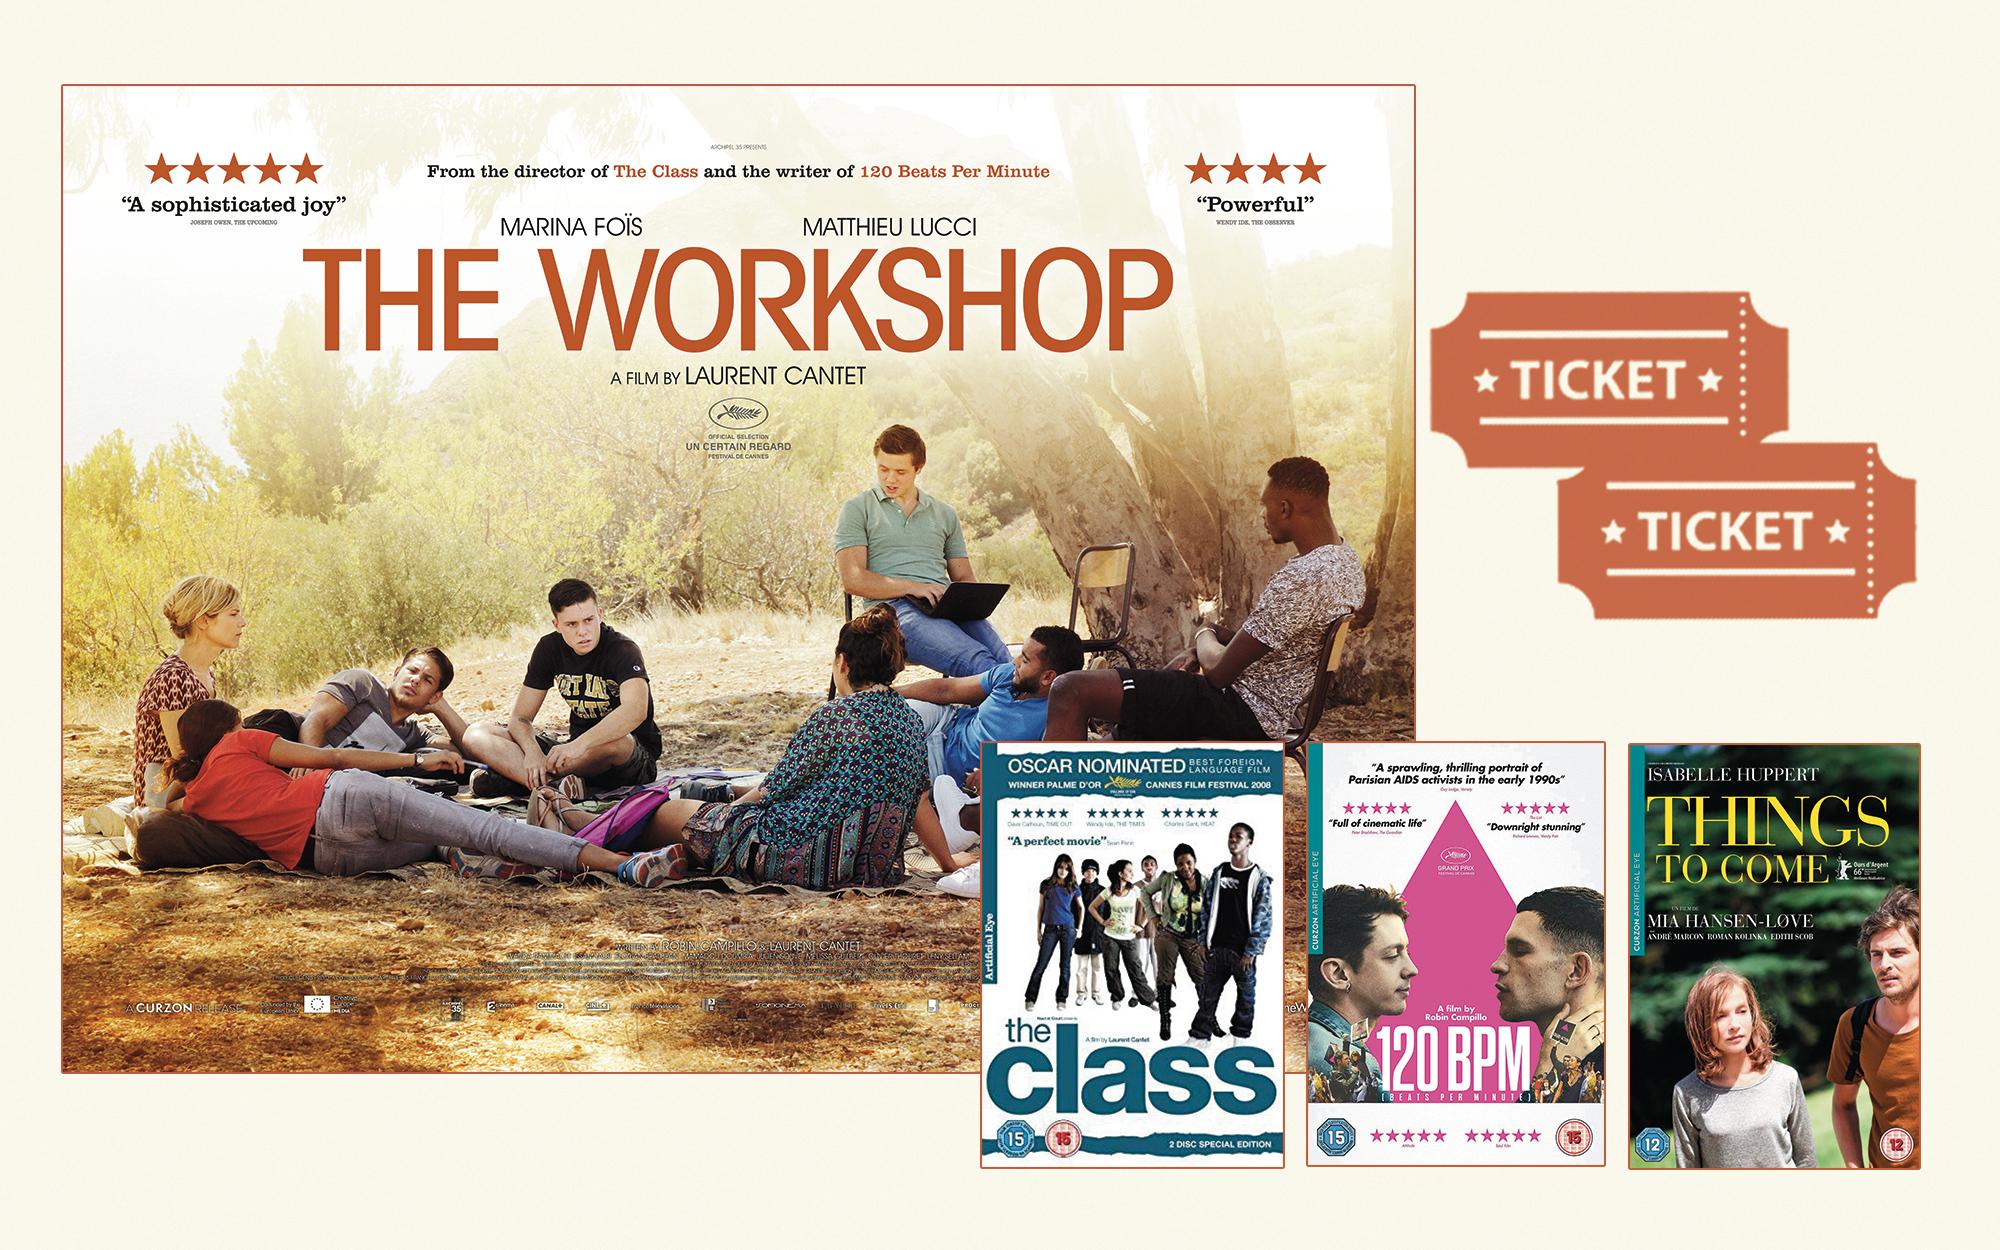 TheWorkshop_CompetitionAssetThumbnail (1).jpg